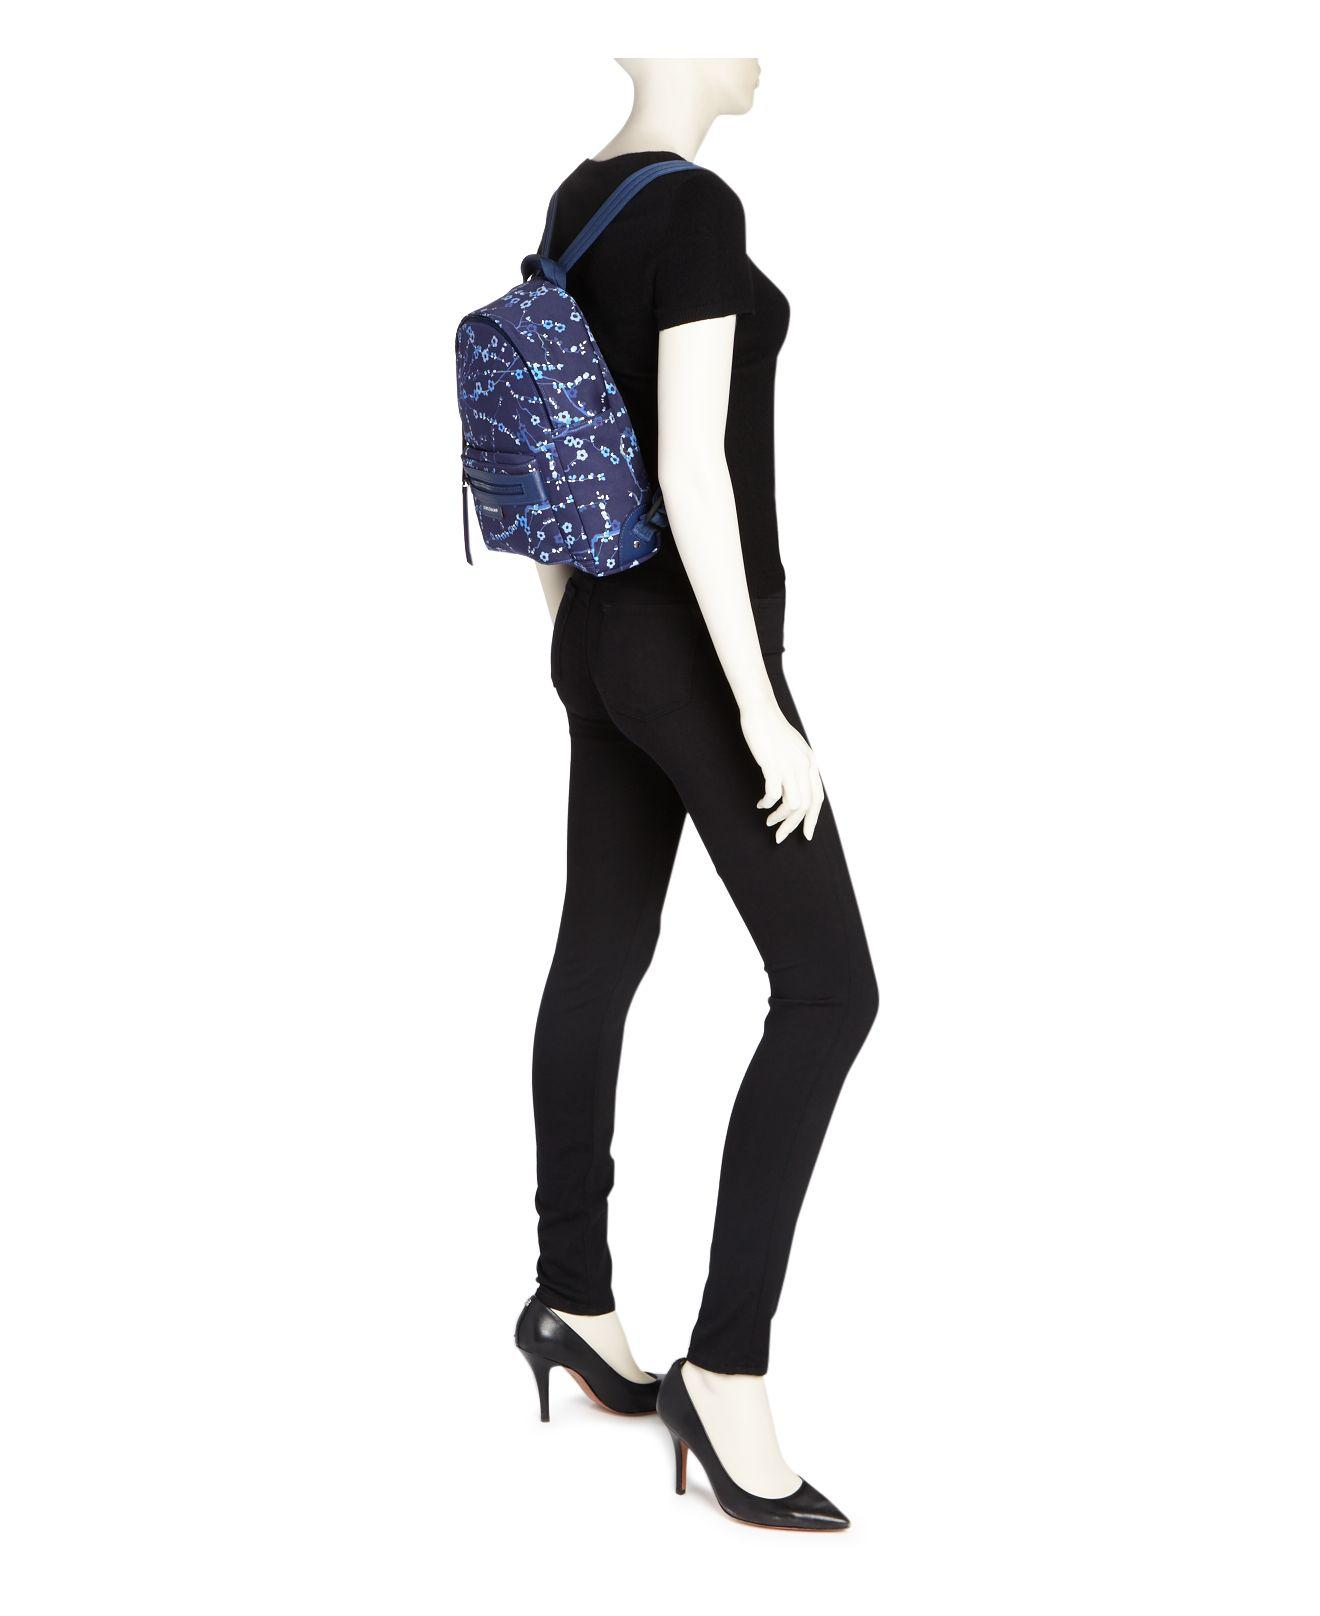 Lyst - Longchamp Le Pliage Neo Sakura Small Nylon Backpack in Blue 3ca77d655d92f